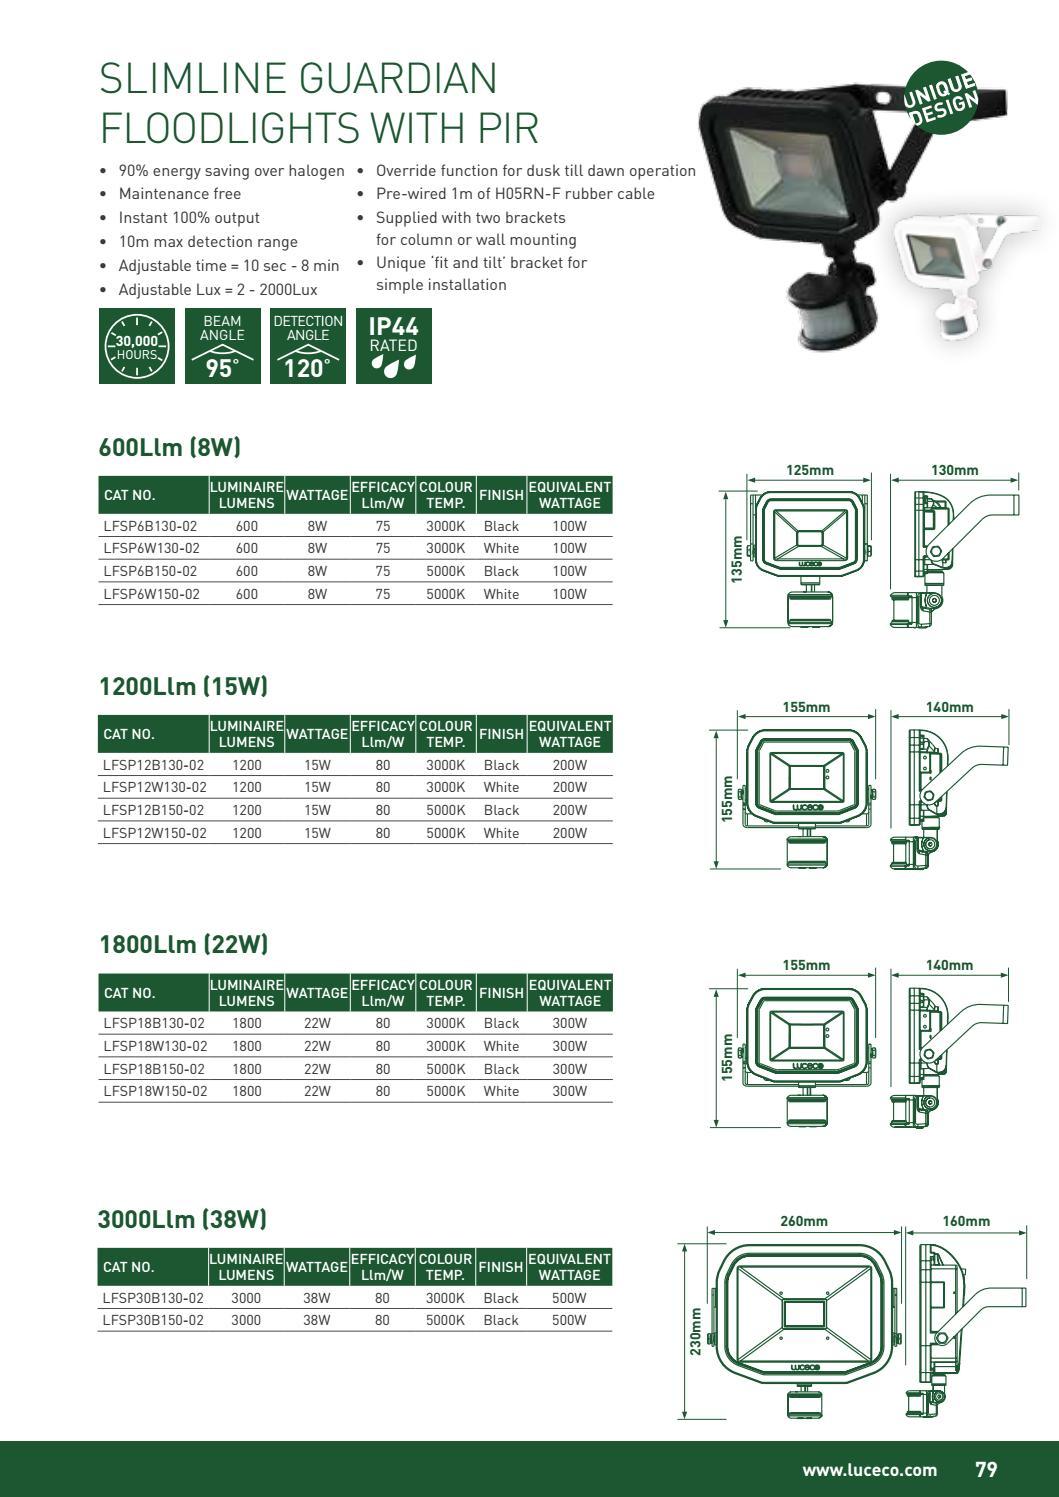 Luceco Guardian Slimline LED Floodlight with PIR IP44 BLACK 15W or 22W Light